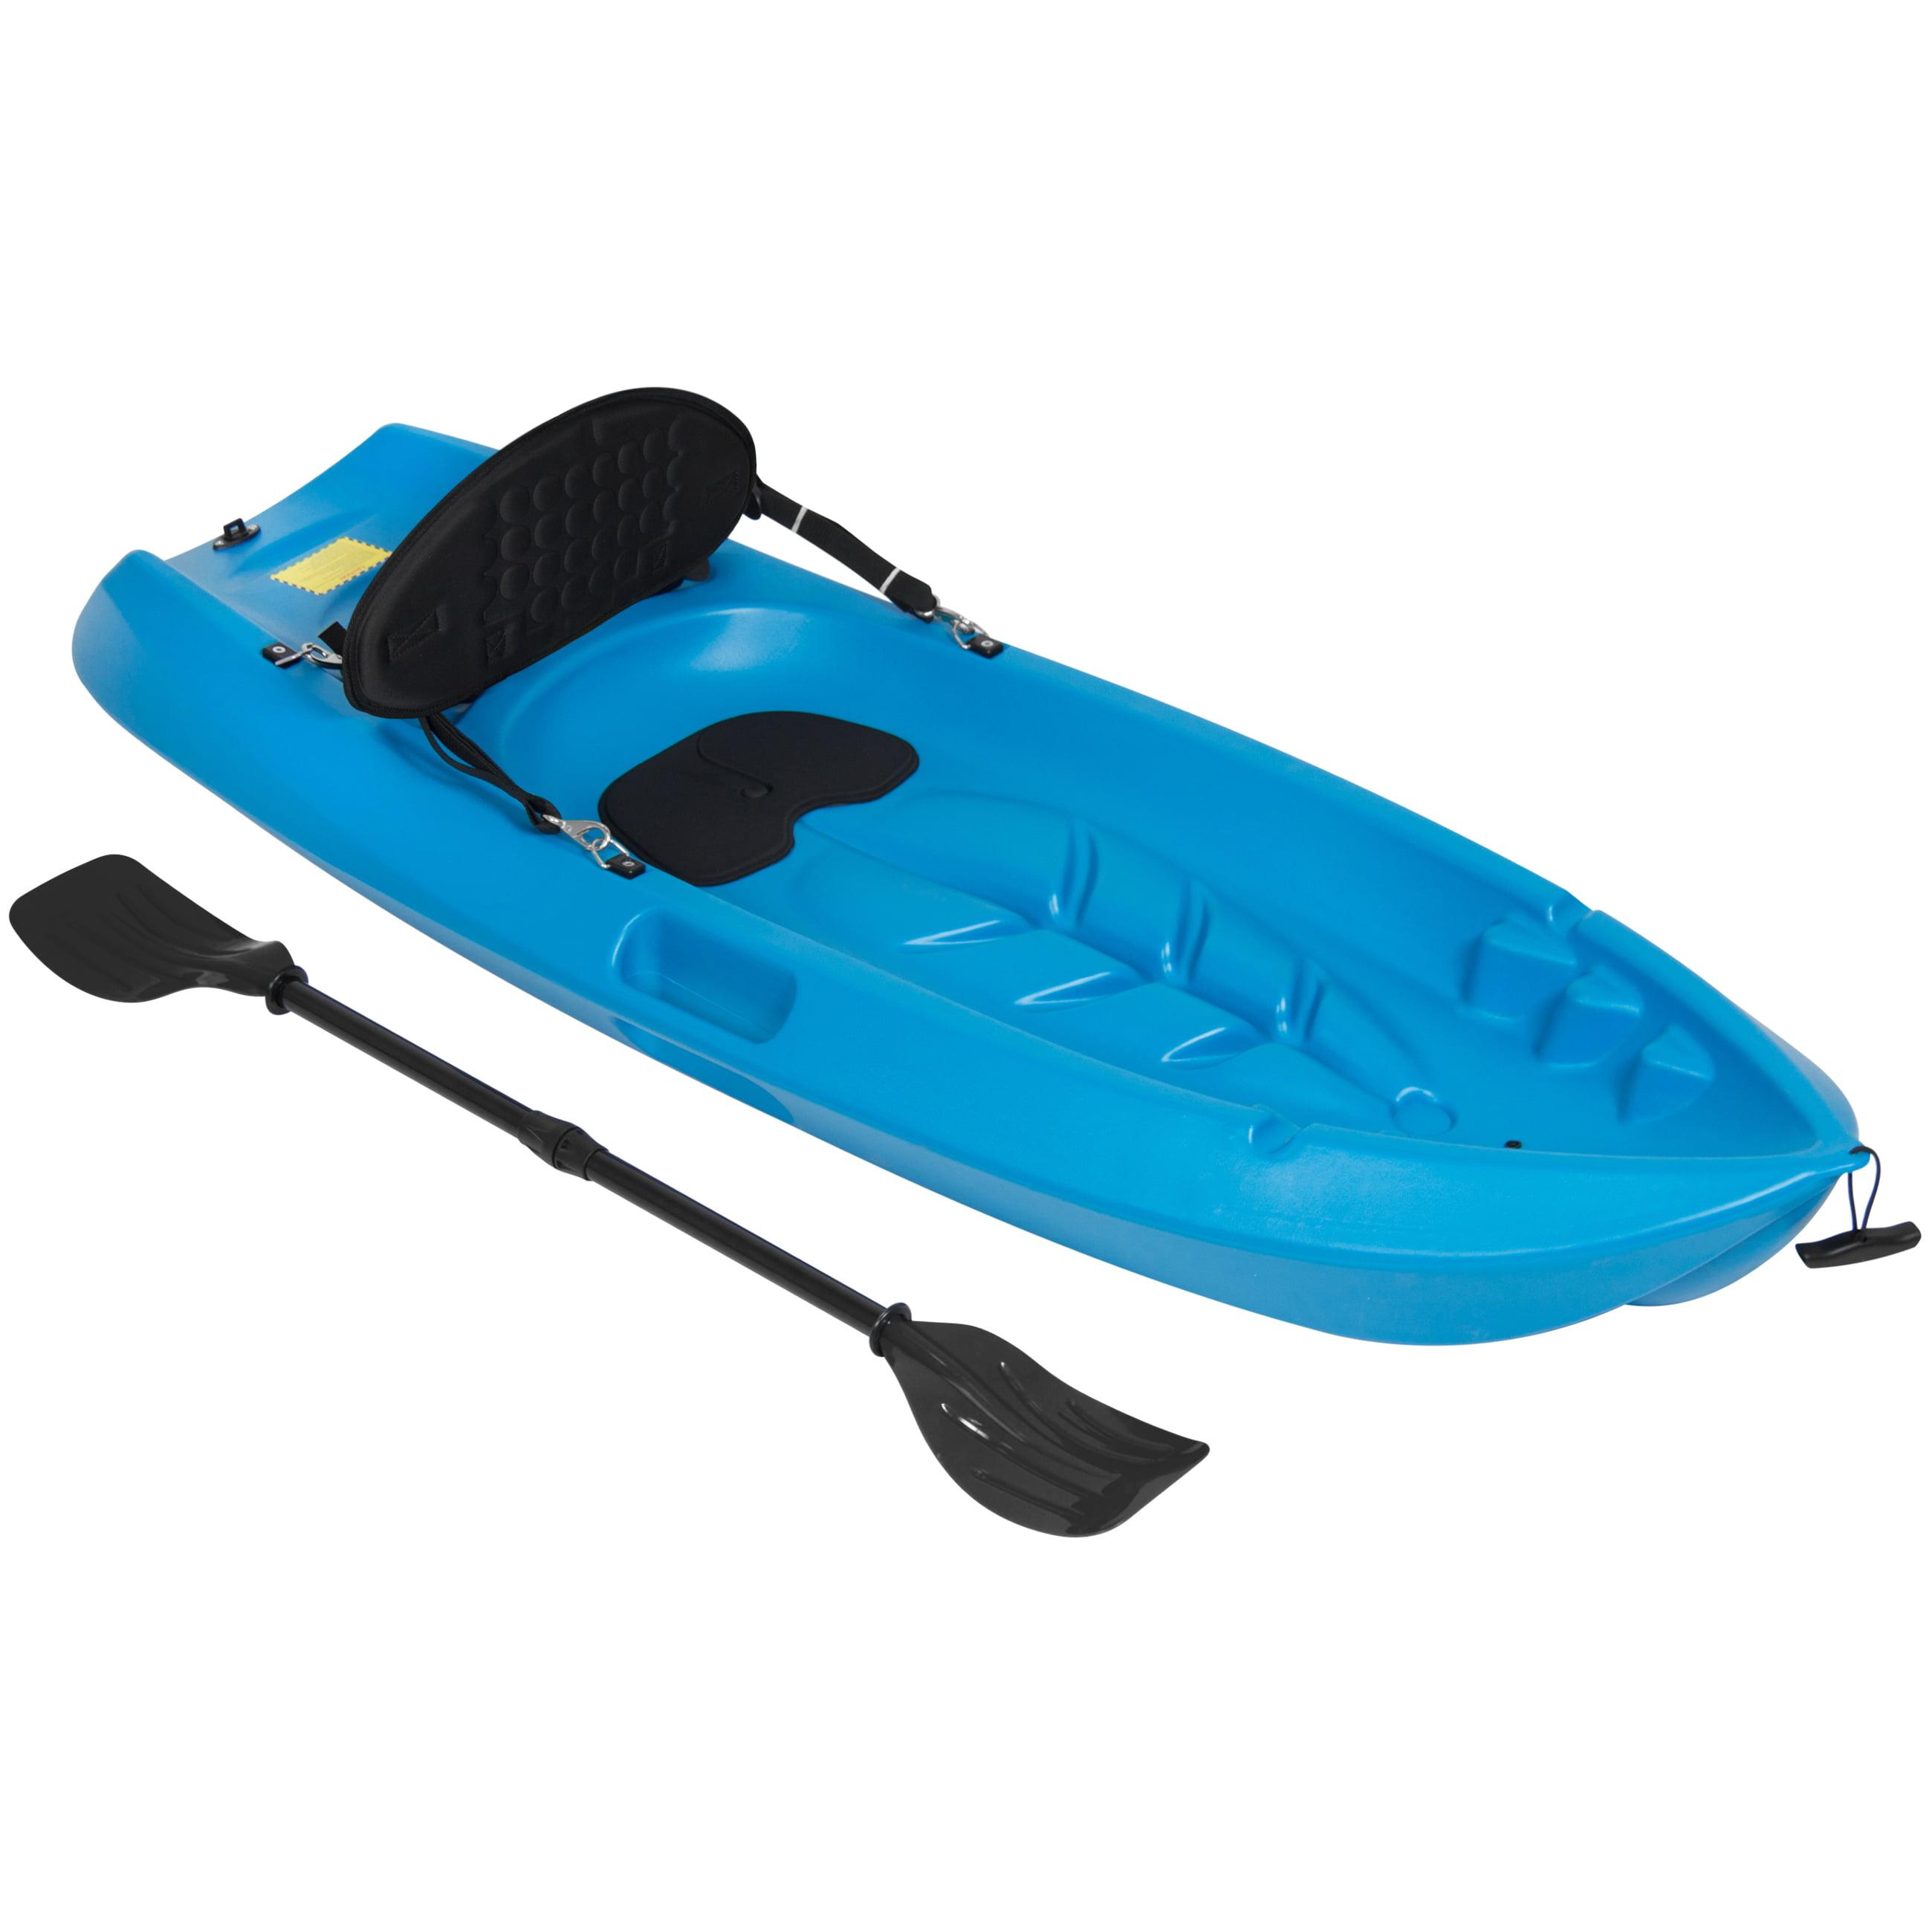 Best Choice Products 6ft Kids Kayak w/ Bonus Paddle and Cushioned Backrest